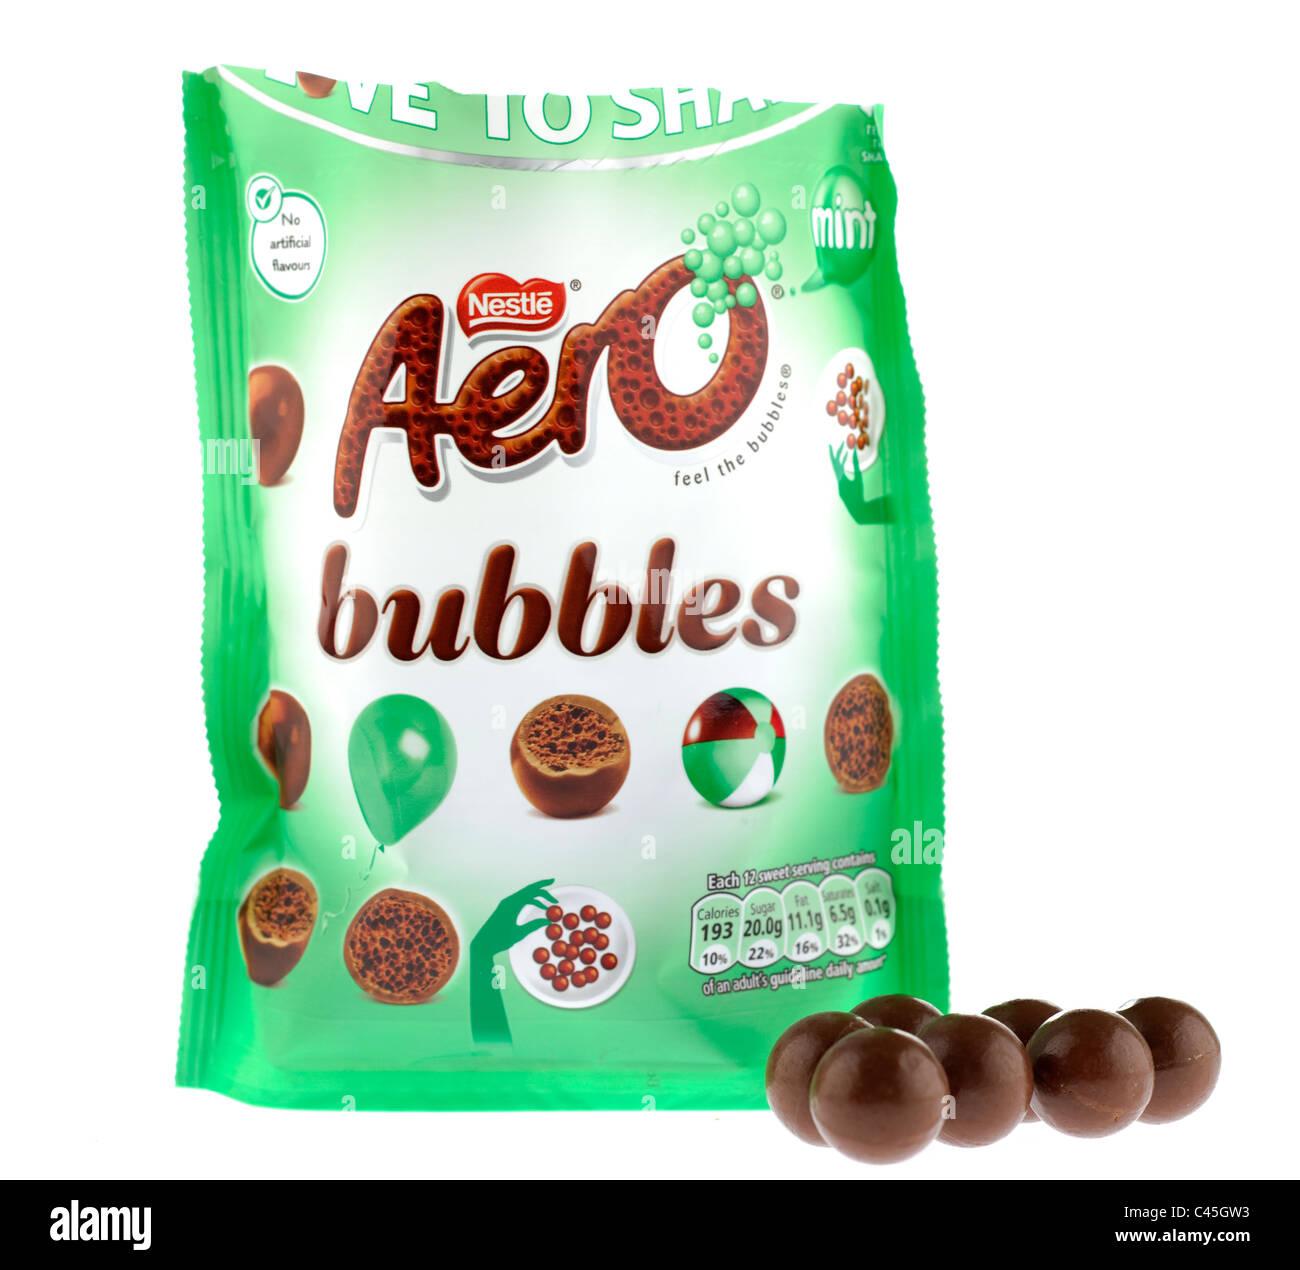 Opened bag of Nestle Aero bubbles - Stock Image